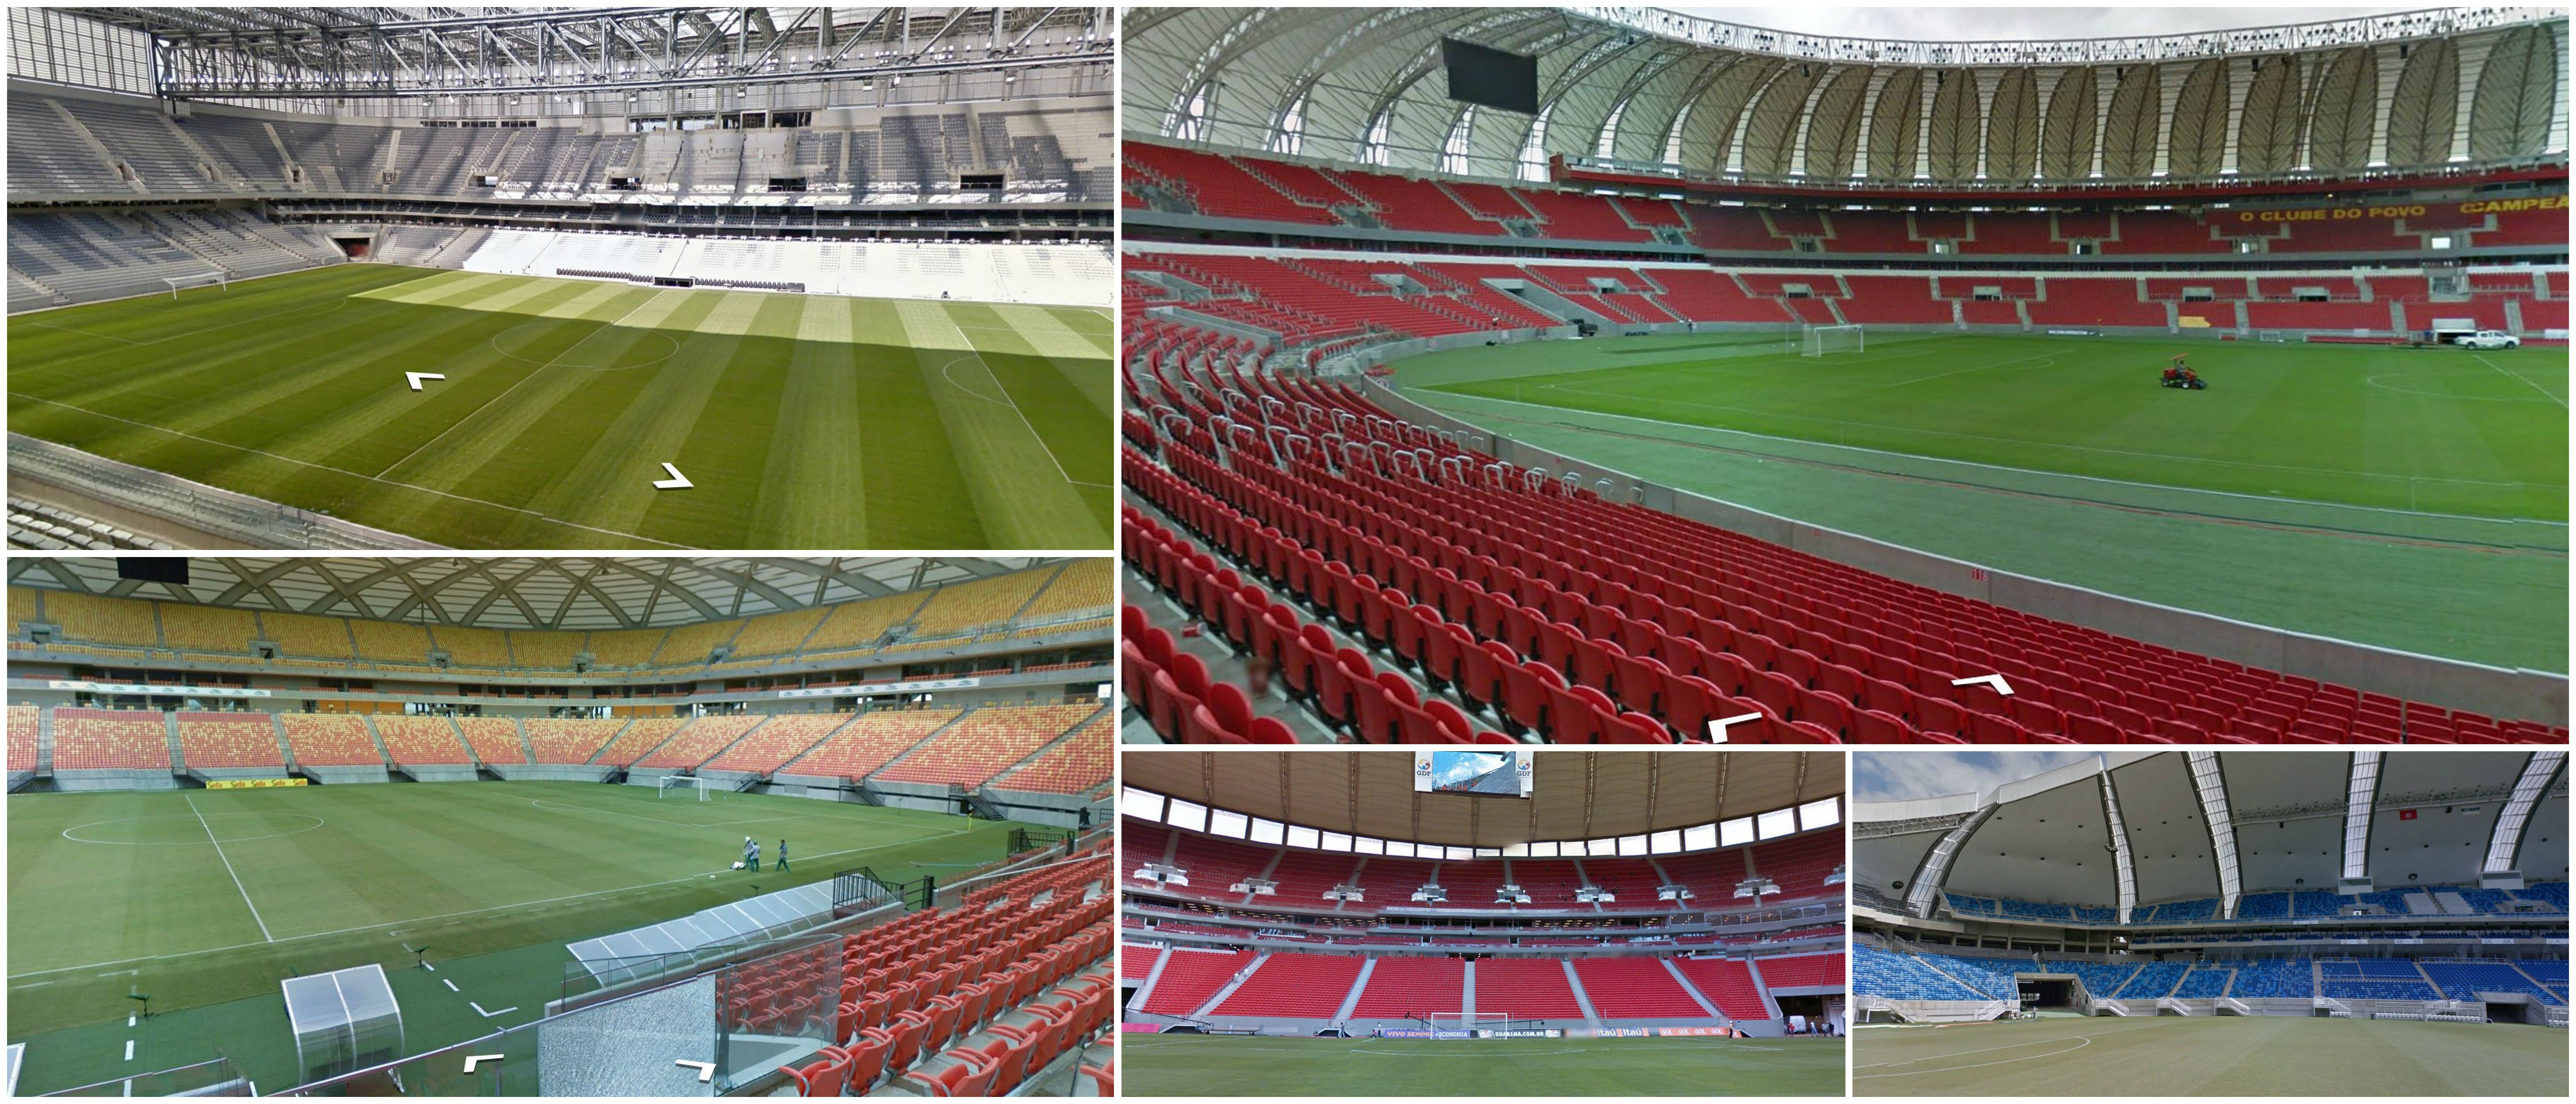 Bezoek alle WK-voetbalstadions in Brazilie; Arena de Sao Paulo; Stadion Mineirão; Estádio do Maracanã; Estádio Nacional de Brasília Mané Garrincha; Beira-Rio